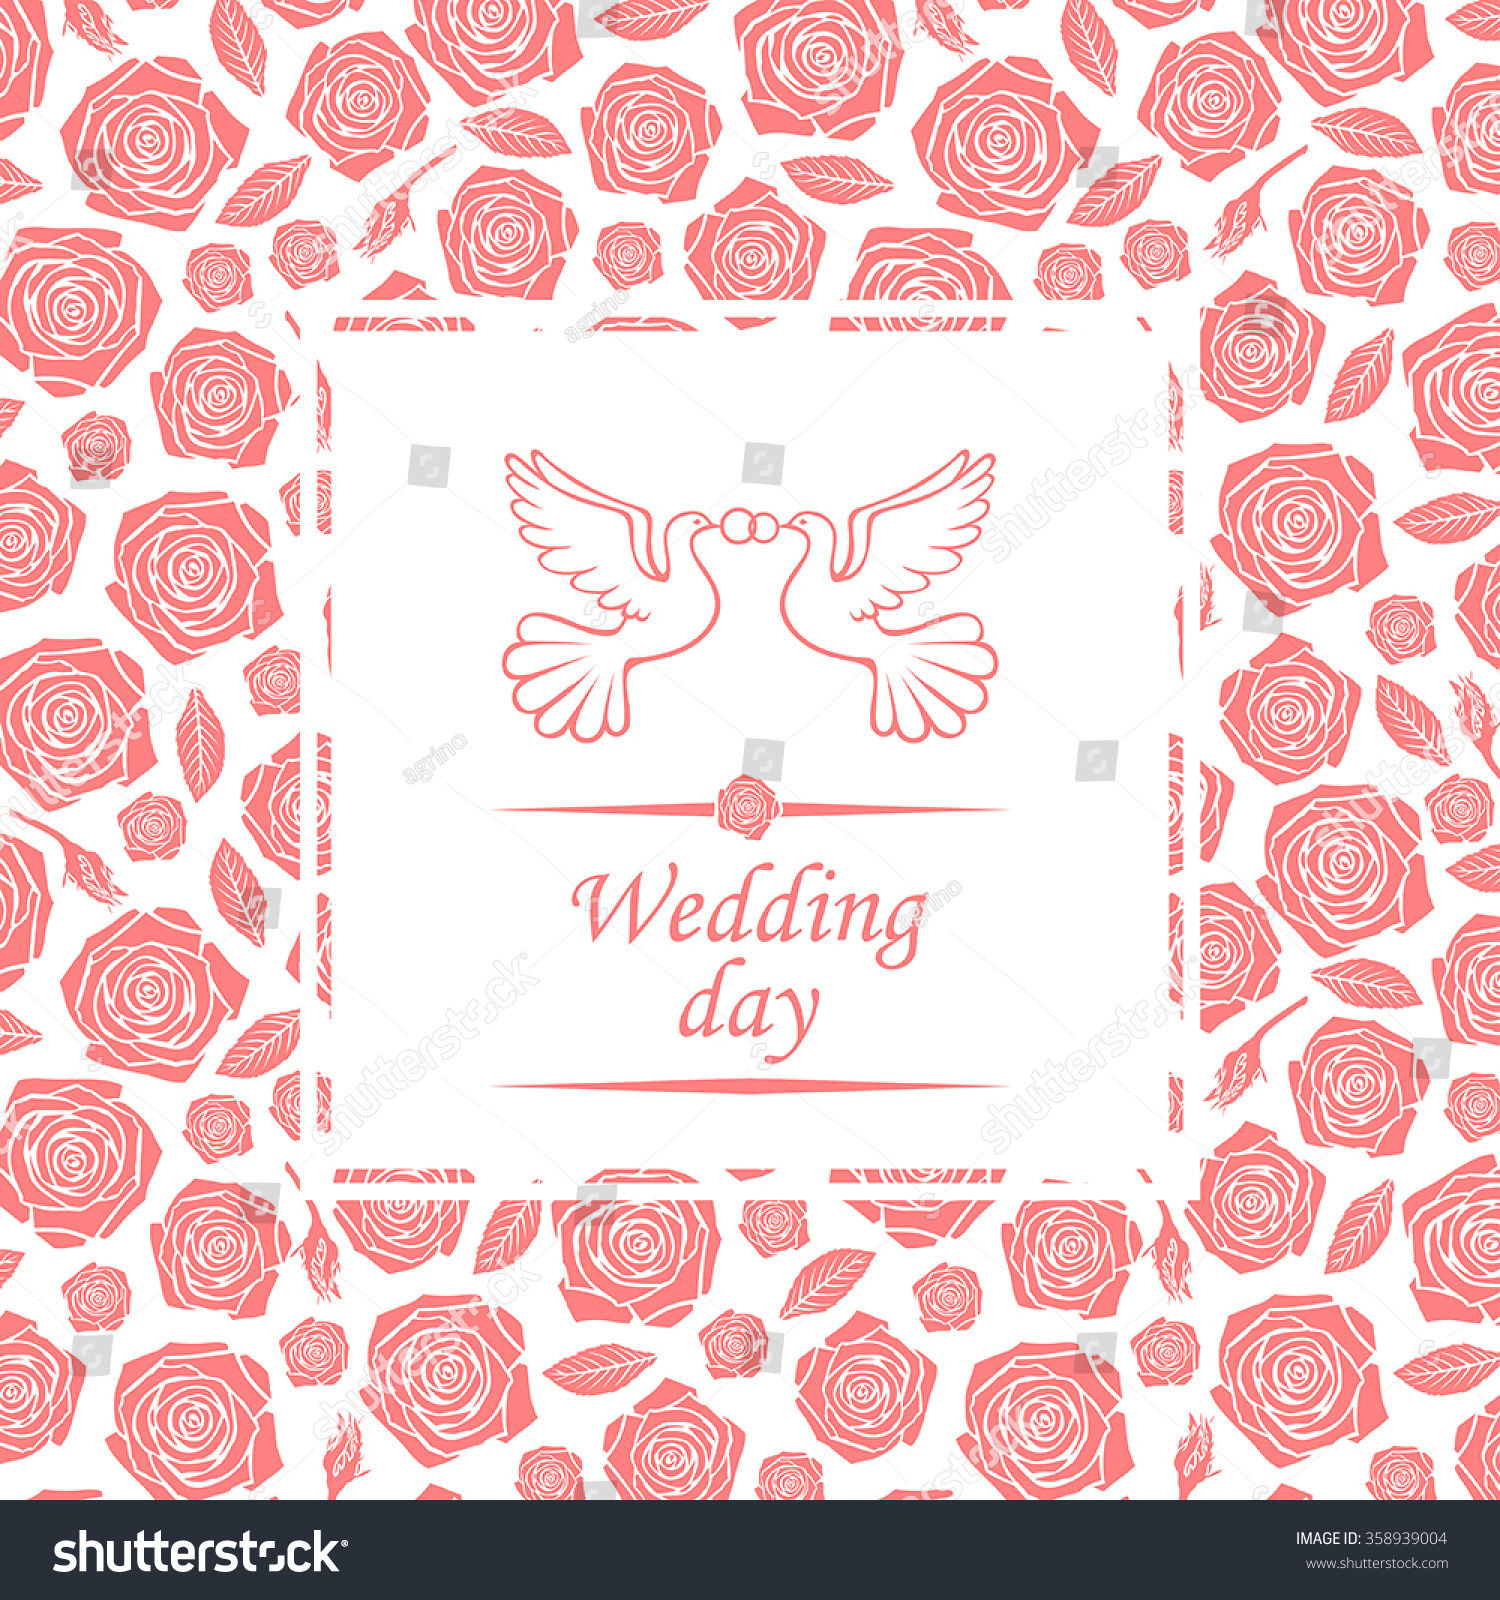 Vector Illustrations Wedding Day Card Greeting Stock Vector ...